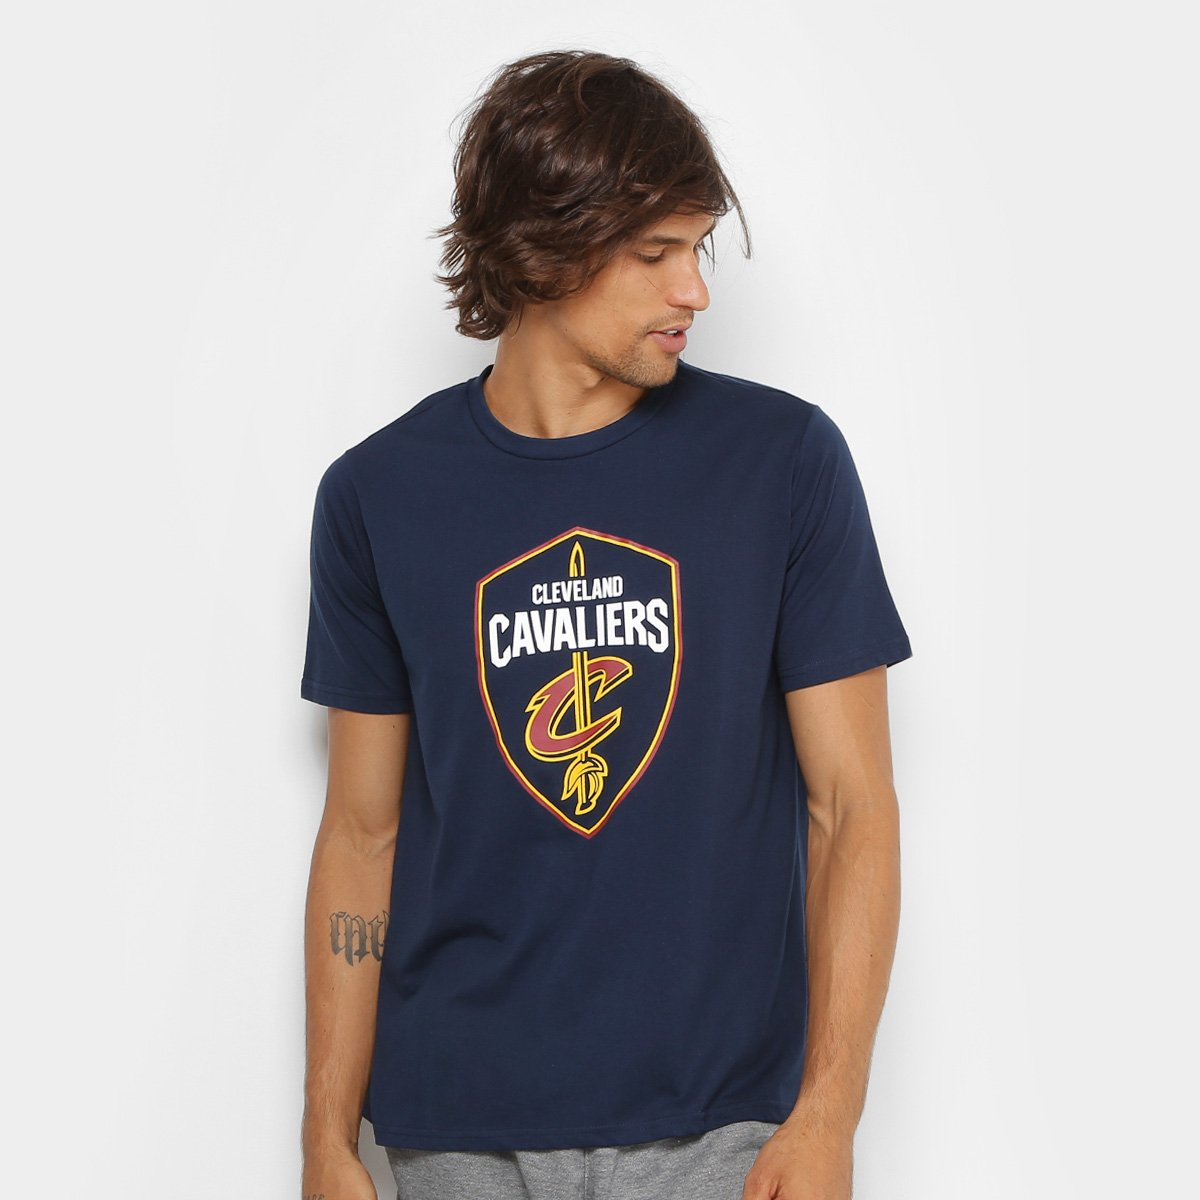 267d12c9d9939 Camiseta NBA Cleveland Cavaliers 17 Masculina - Compre Agora